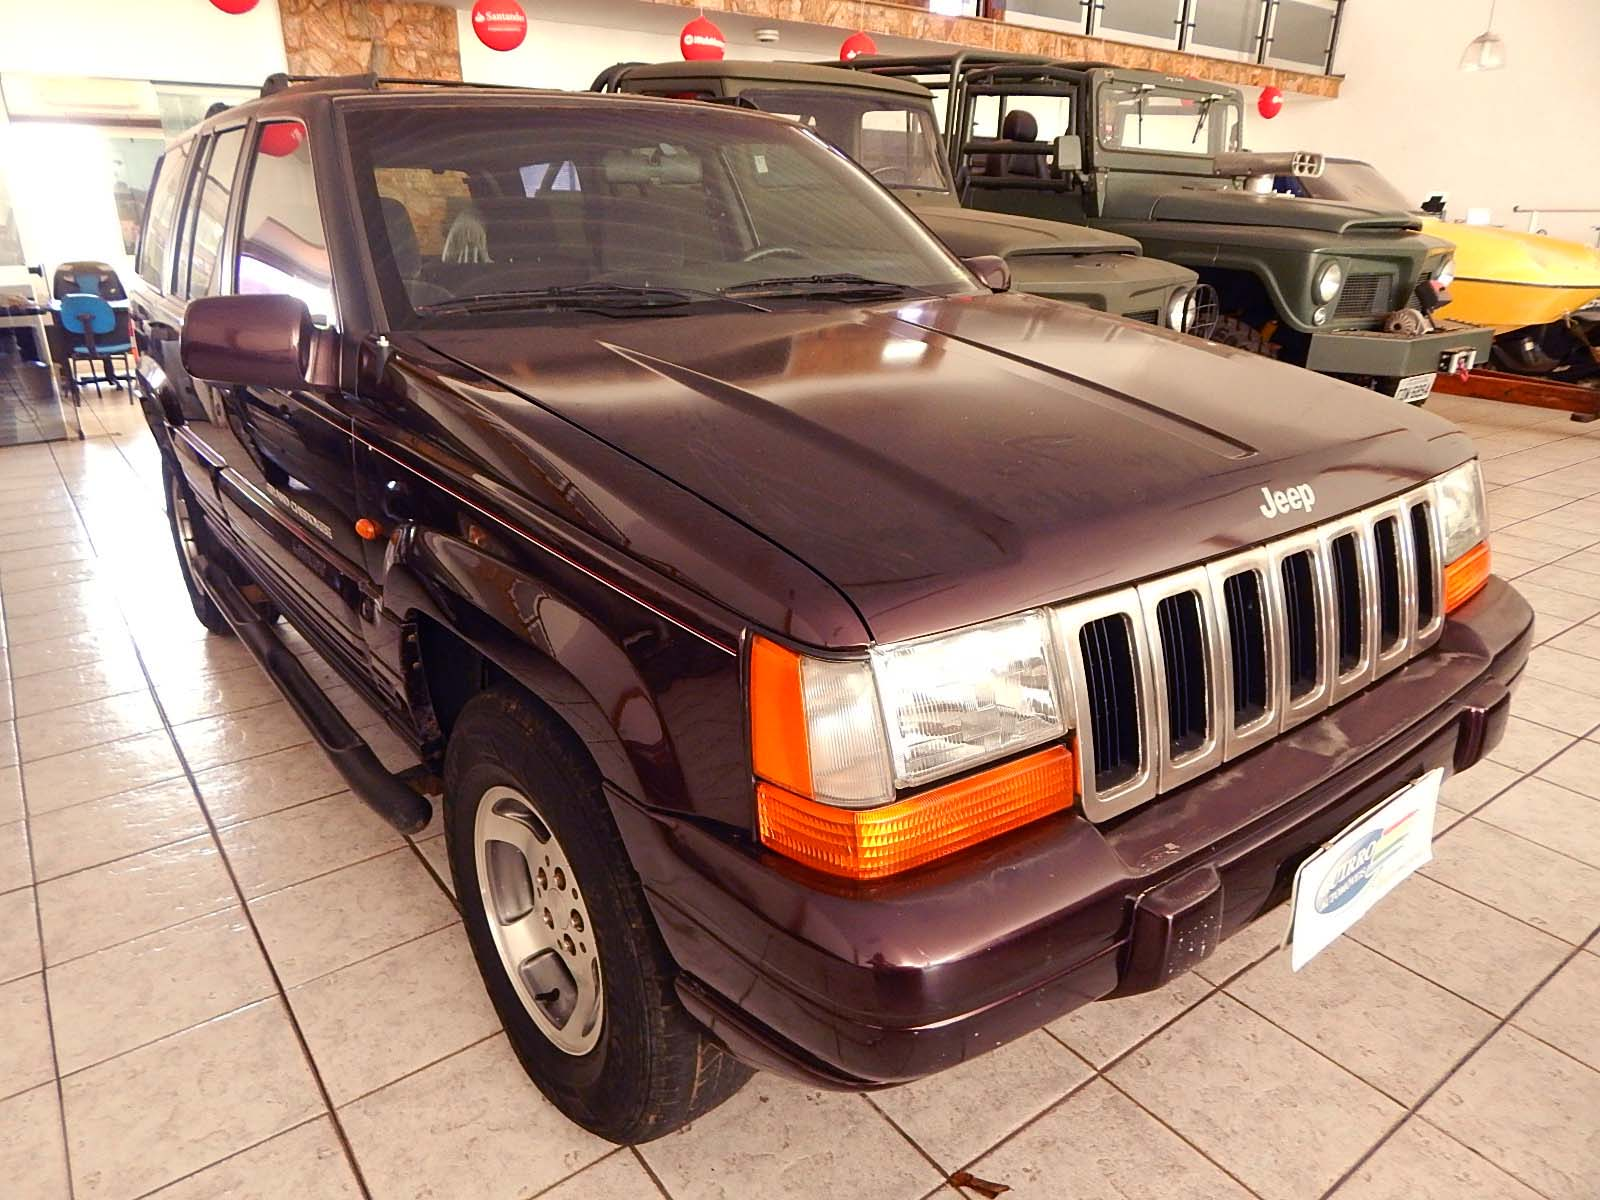 1997/1998 - Gasolina